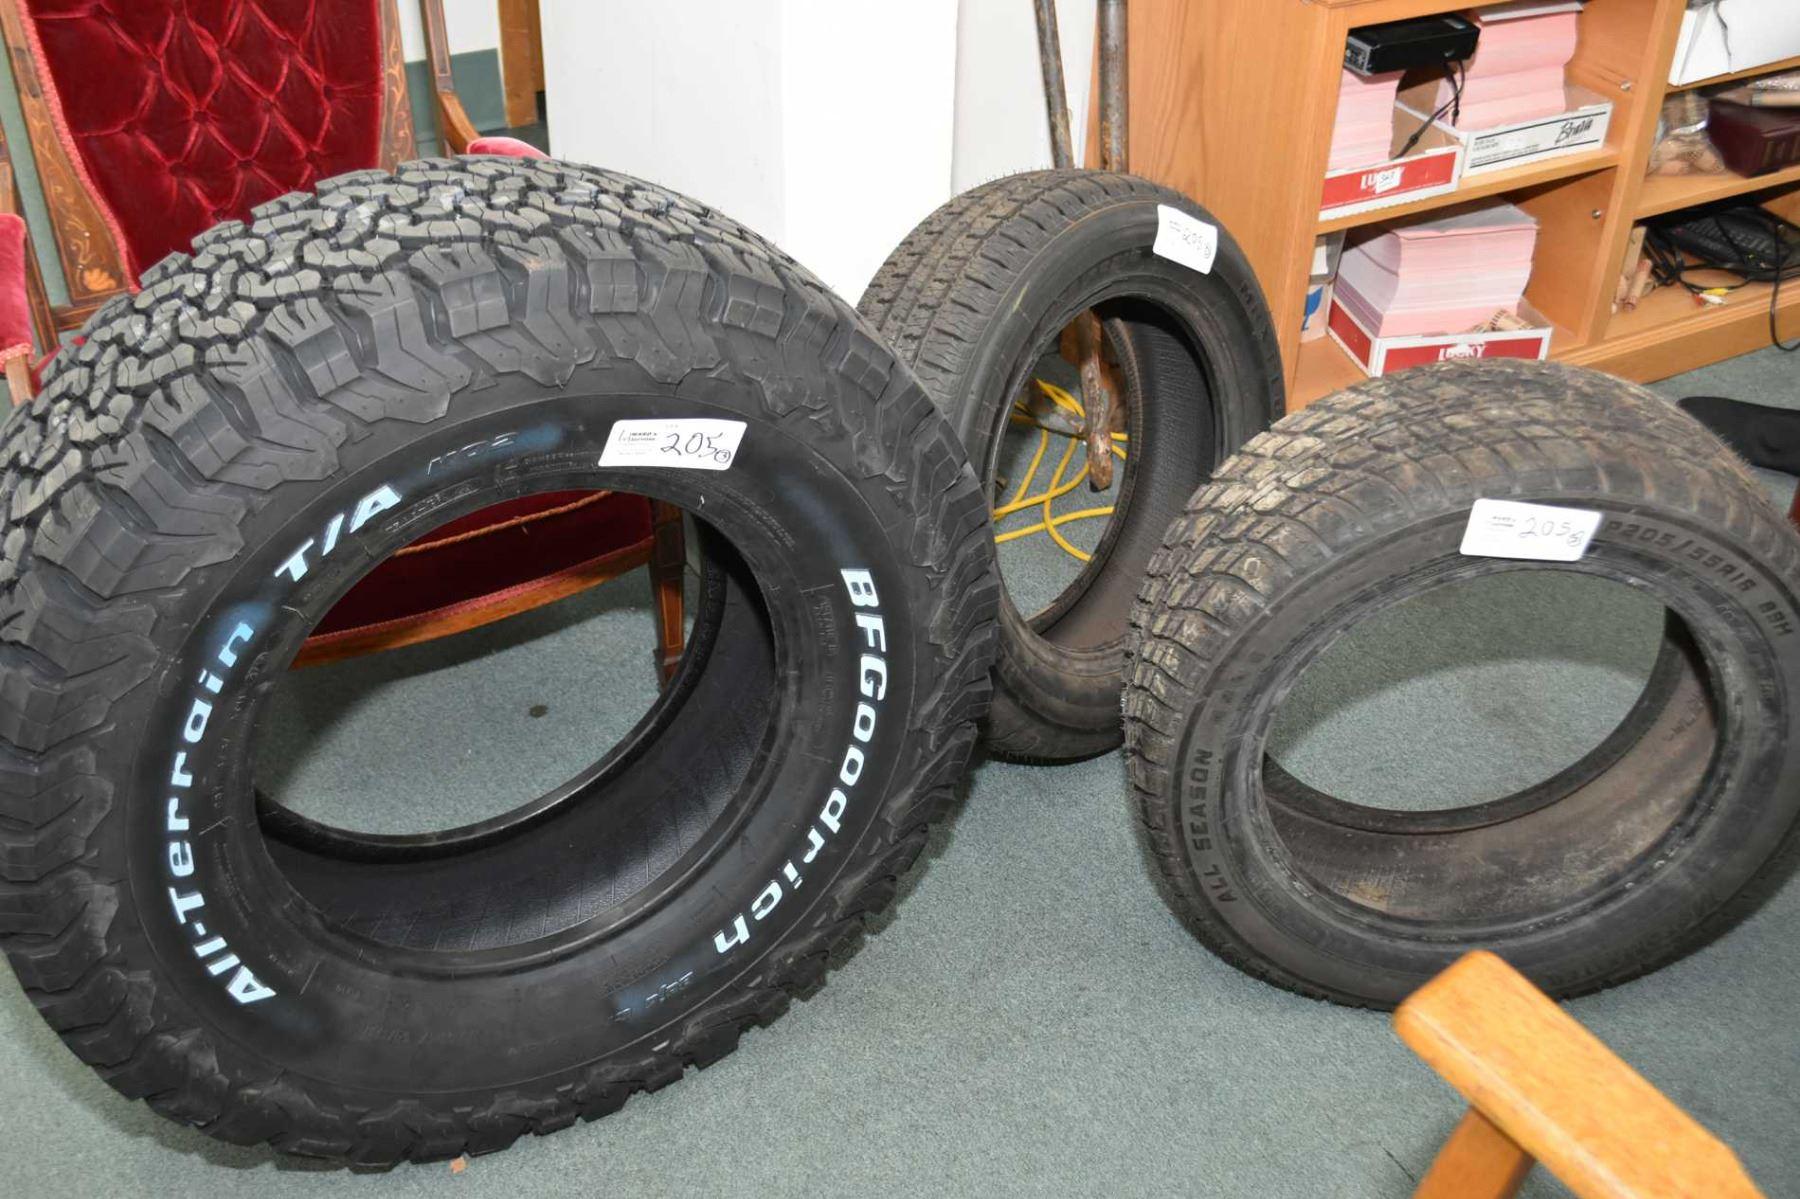 Three brand new tires including B F Goodrich All Terrain K02 LT285